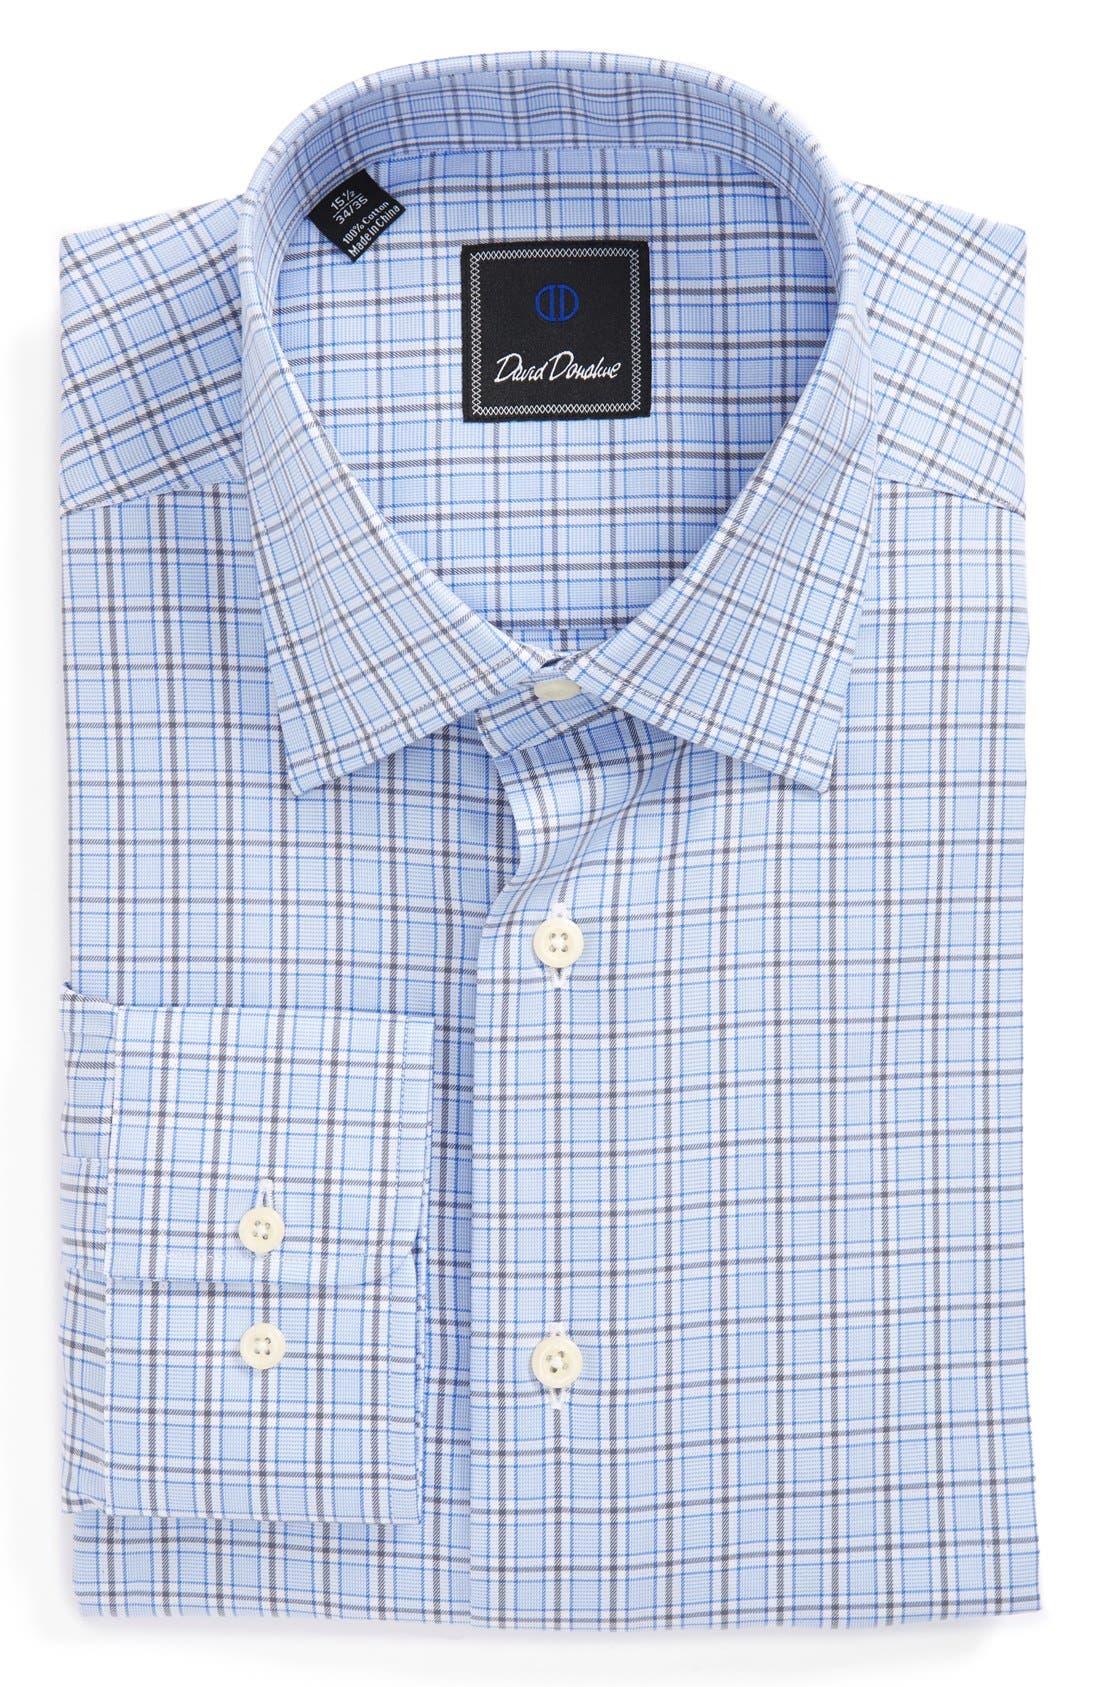 Regular Fit Plaid Dress Shirt,                             Main thumbnail 1, color,                             489